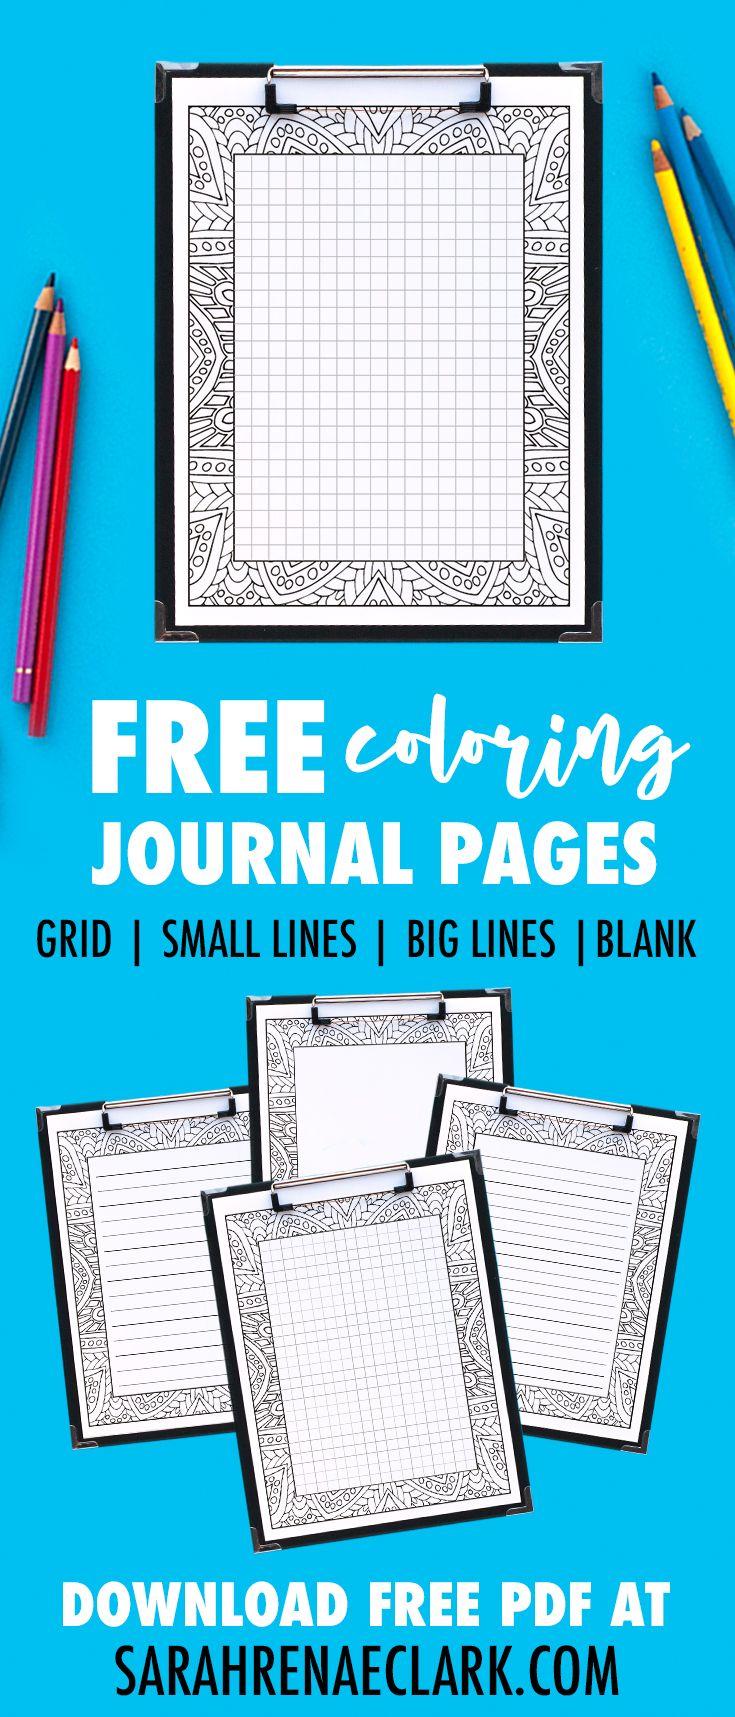 Free Printable Coloring Journal Pages Sarah Renae Clark Coloring Book Artist And Designer Coloring Journal Free Printable Coloring Printable Coloring